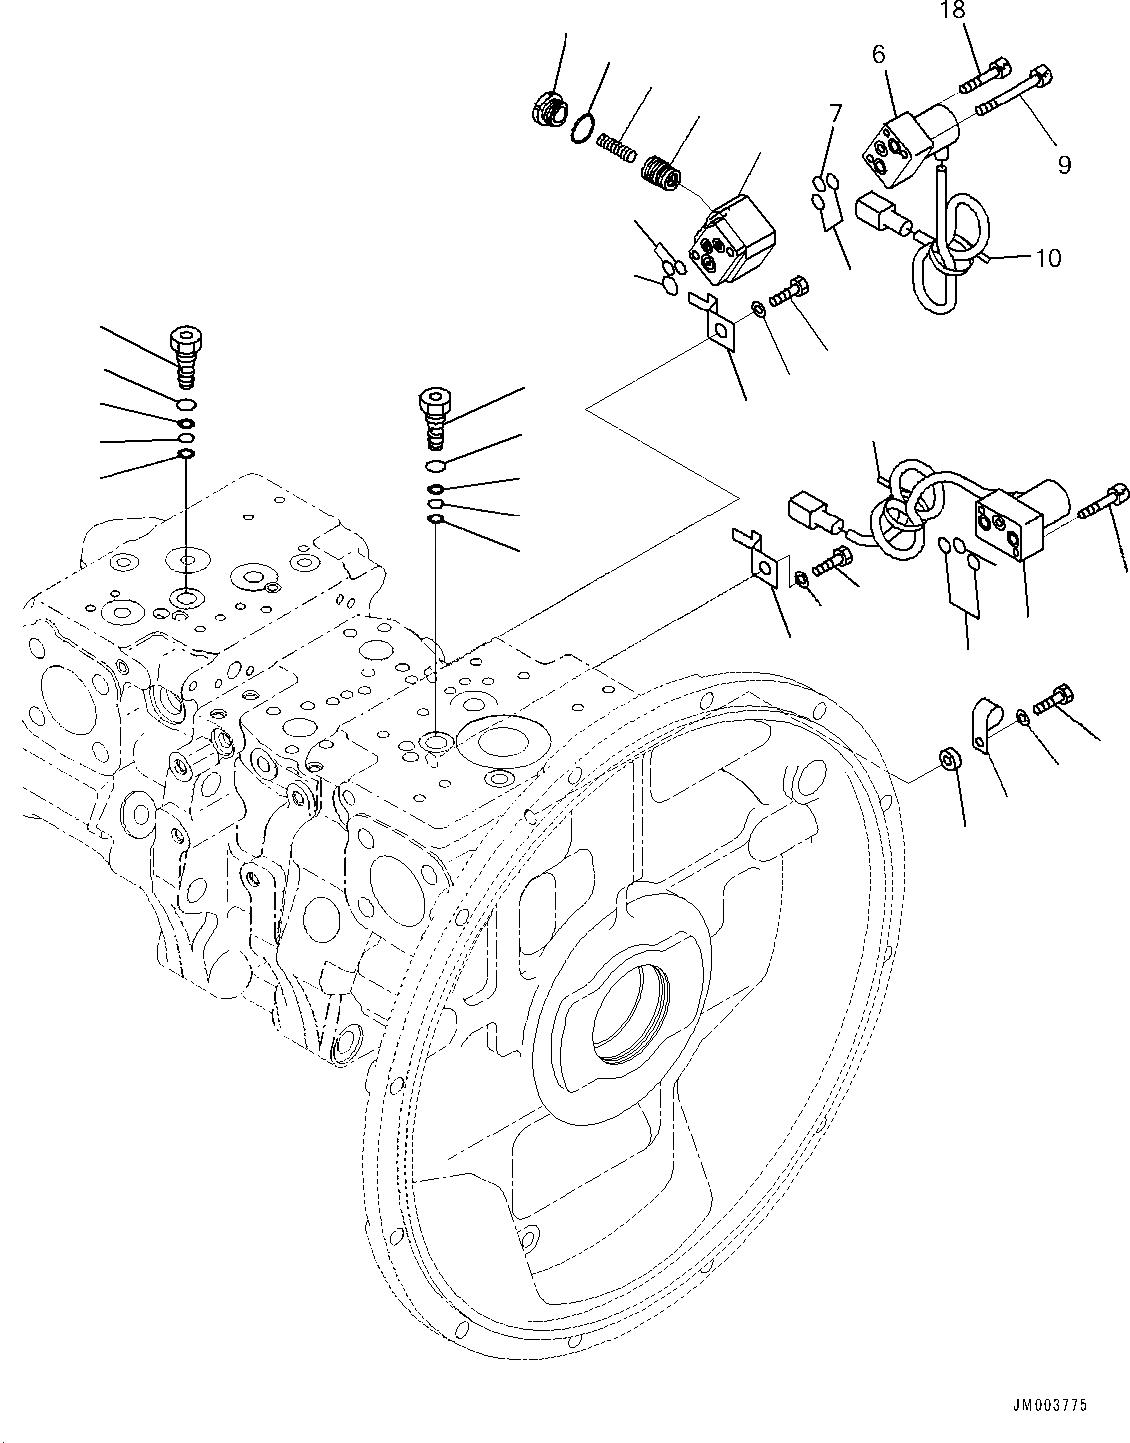 702-21-56600 Komatsu КЛАПАН В СБОРЕ